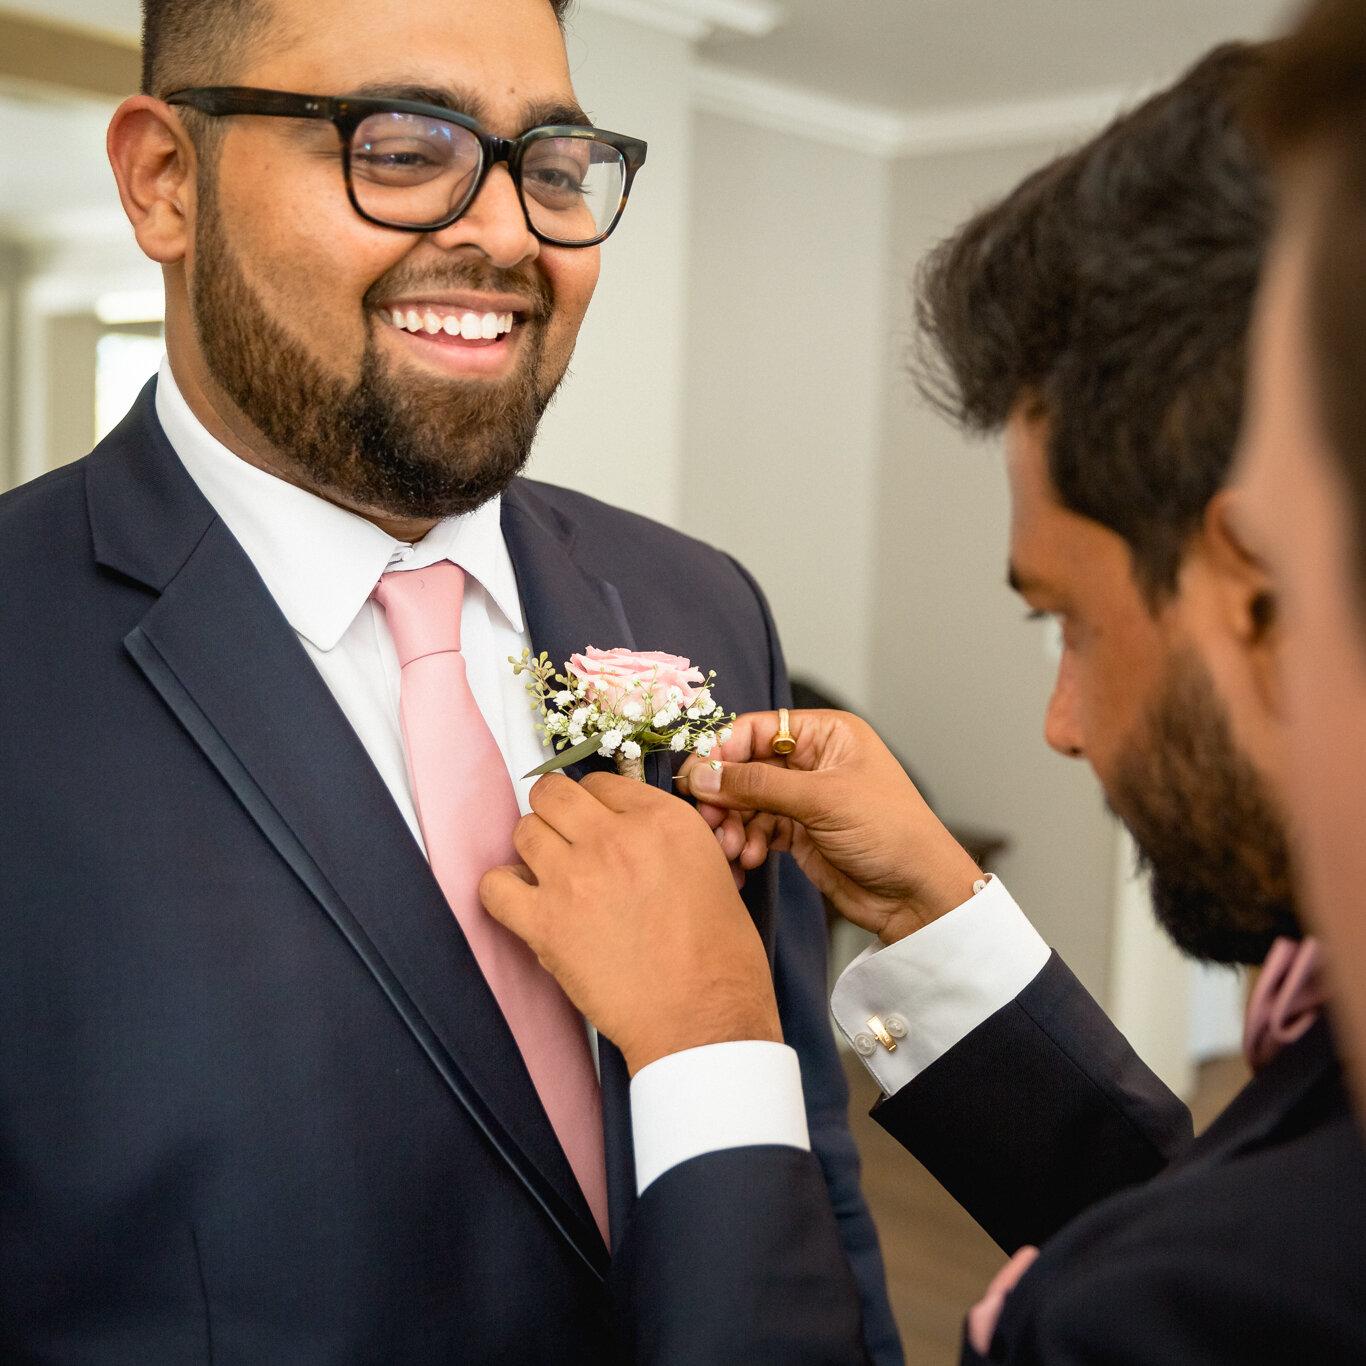 2019.08.24_Emily-Ashir-Wedding-at-the-Maples-5163.jpg